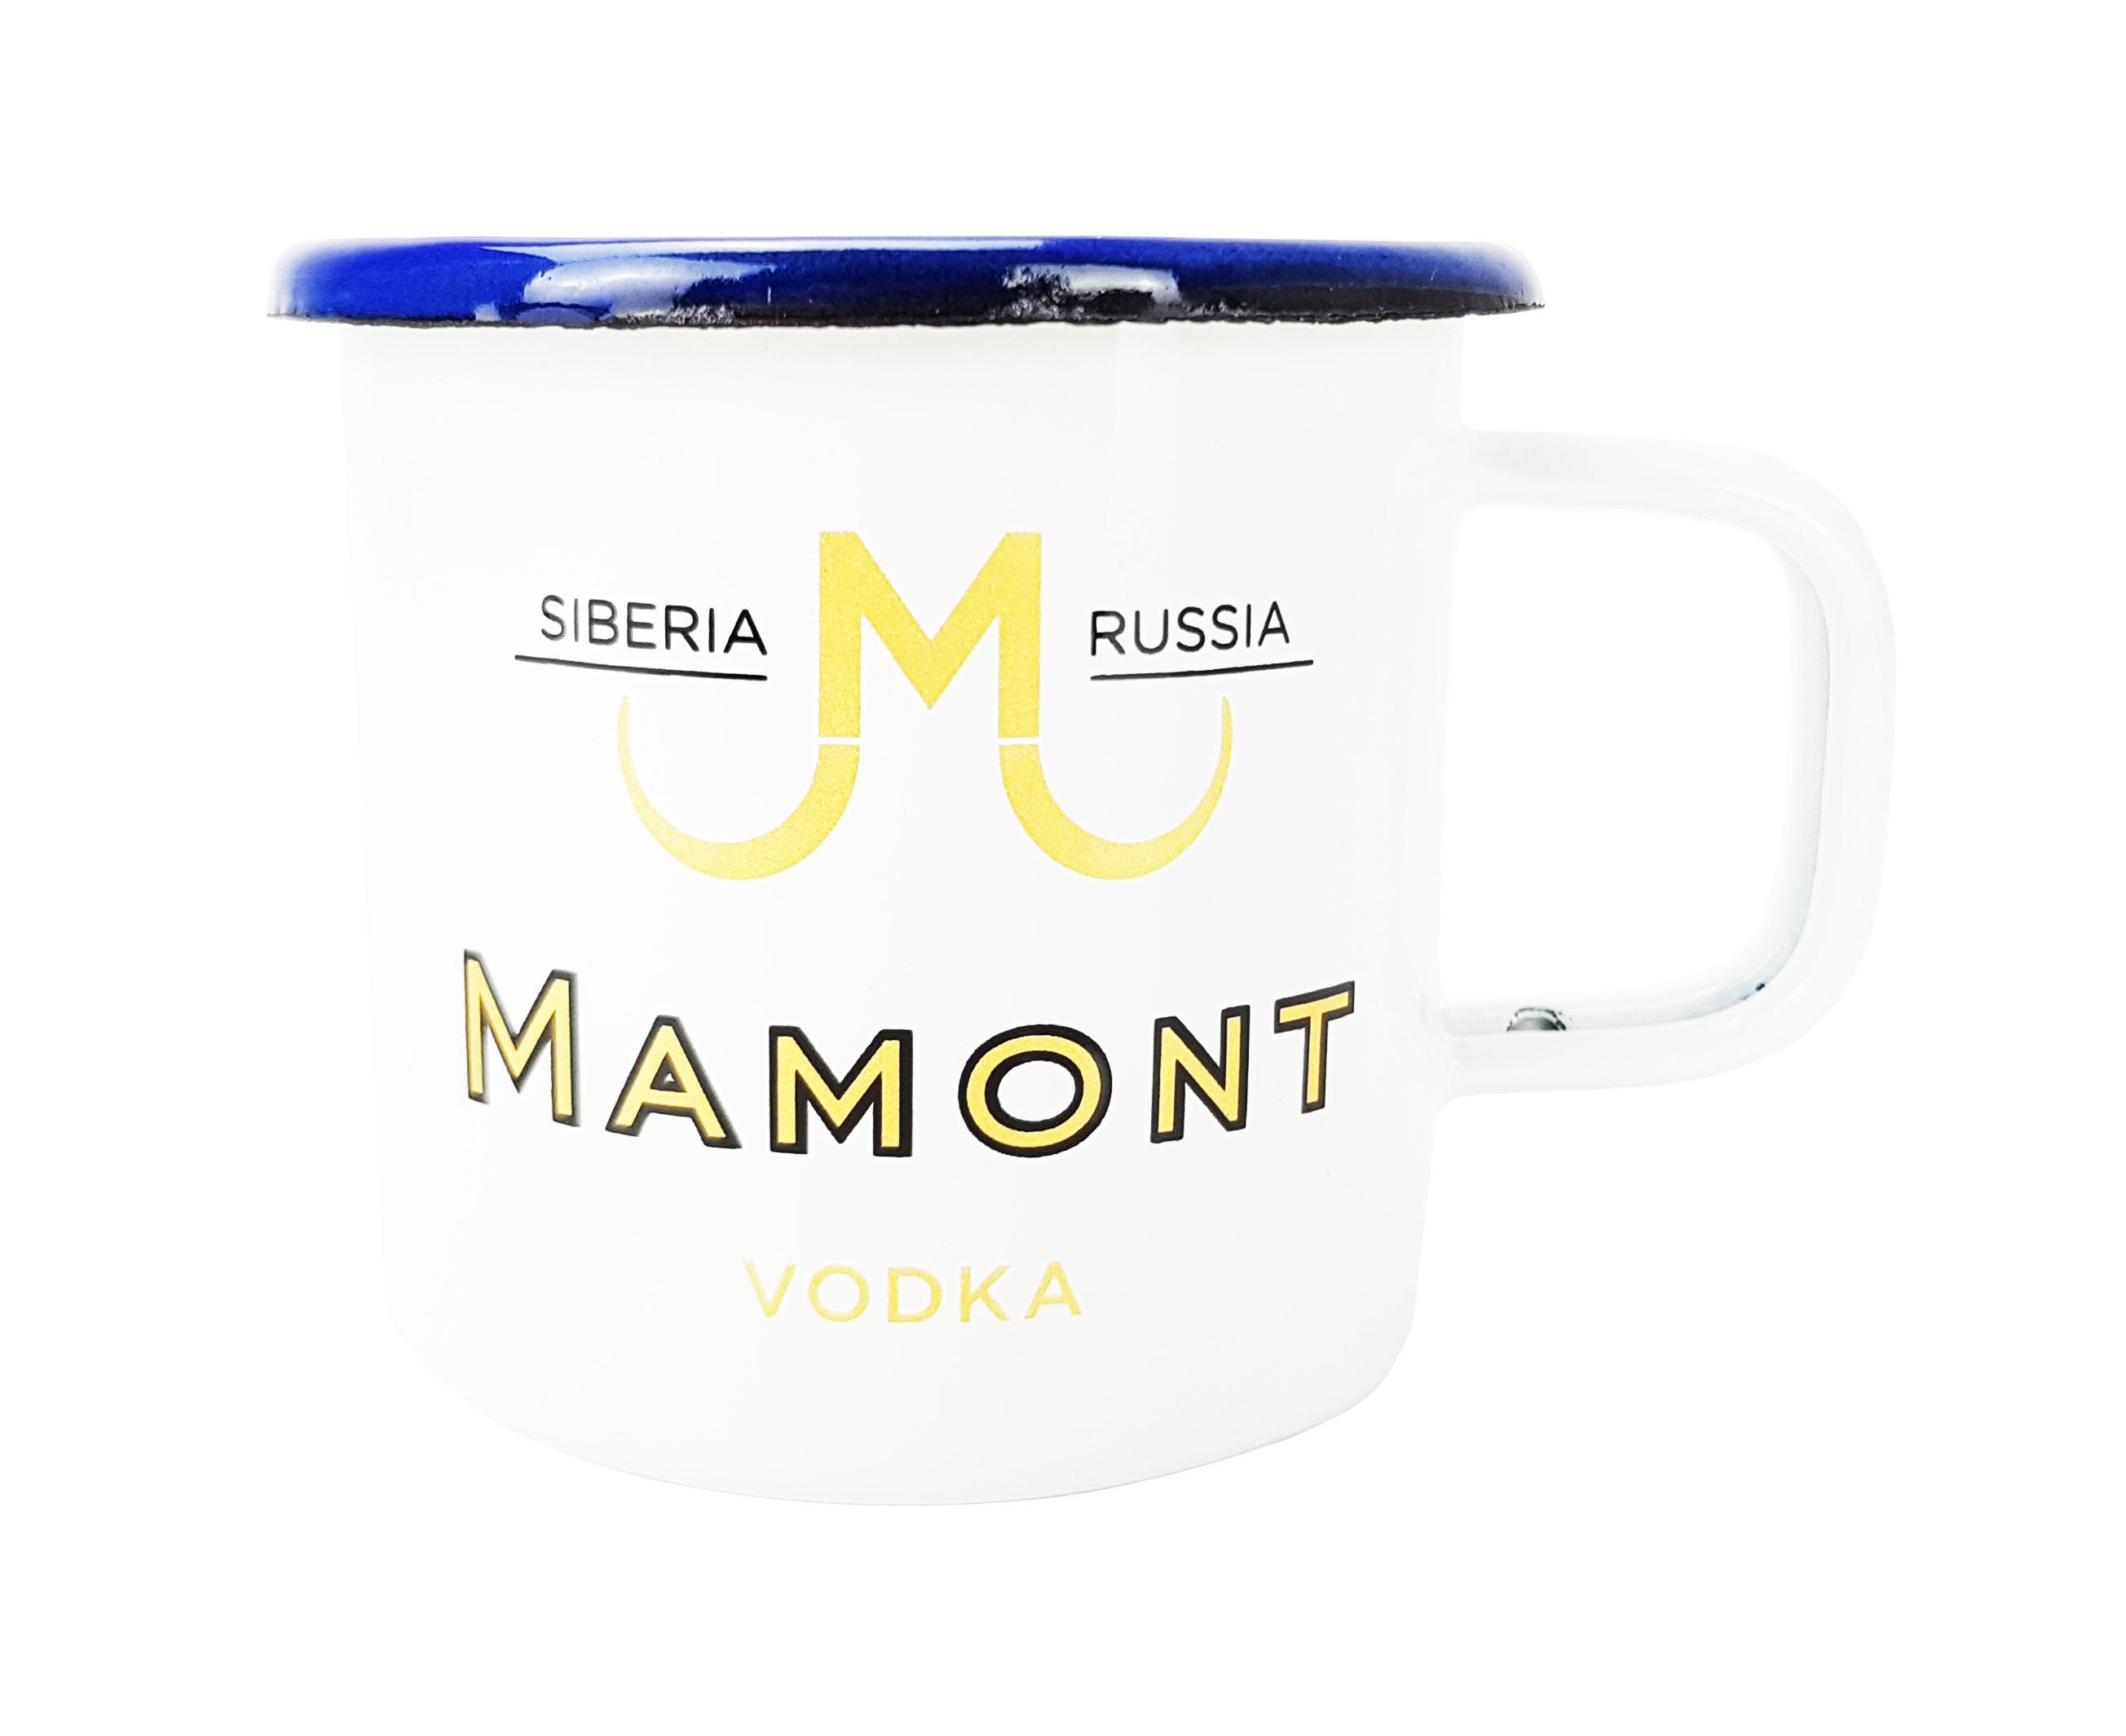 Mamont Vodka Wodka Moscowmule Becher Moscow Mule cocktail Becher Longdrink Glas Gläser